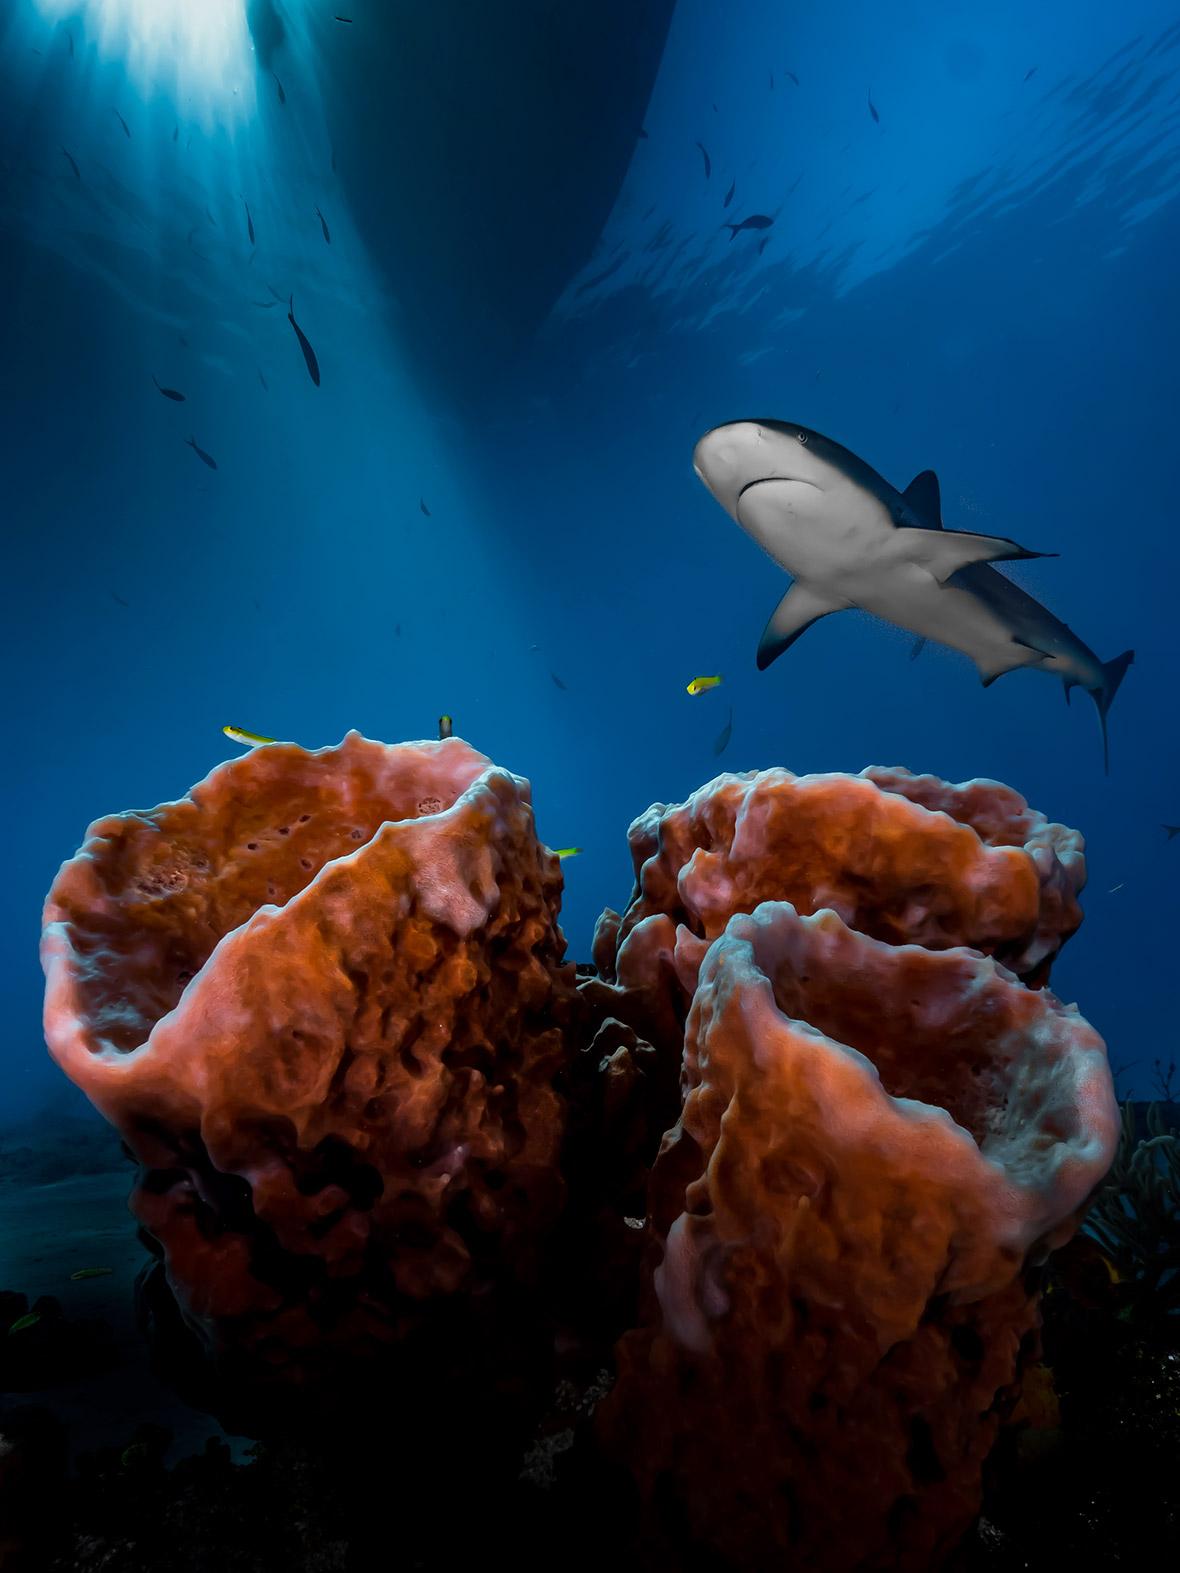 Underwater Photographer of the Year 2016